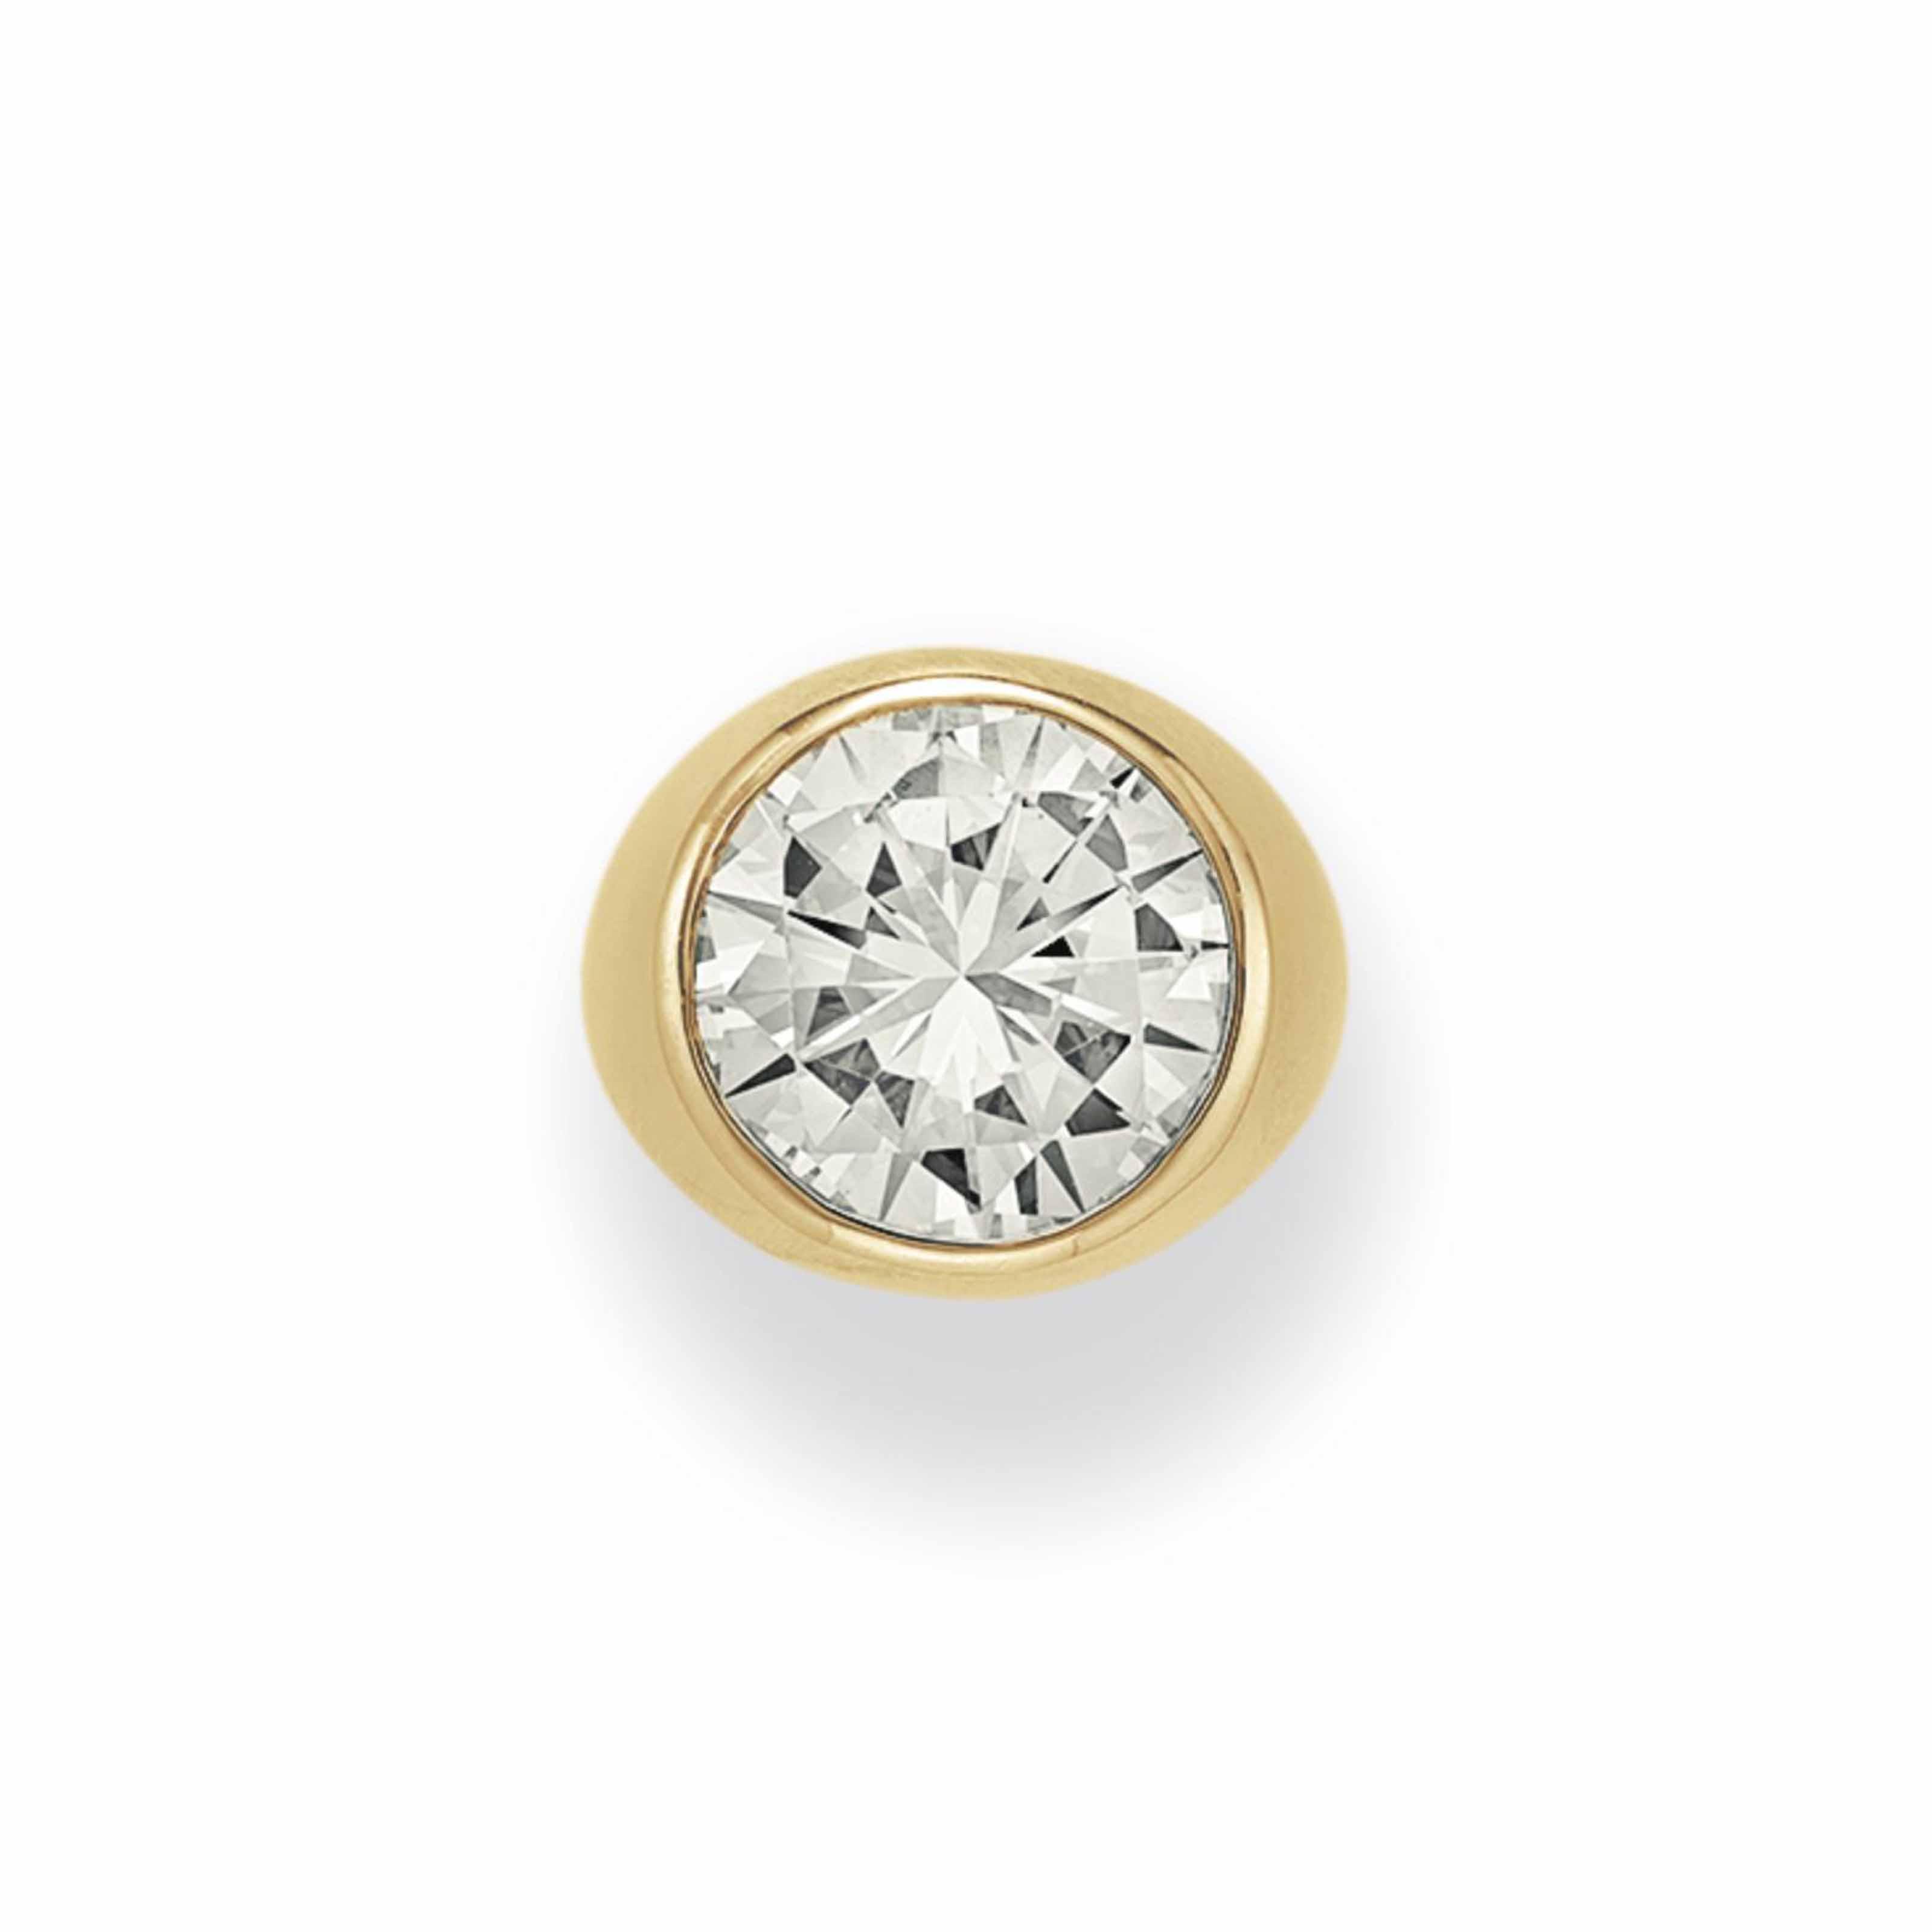 A DIAMOND RING, BY BVLGARI